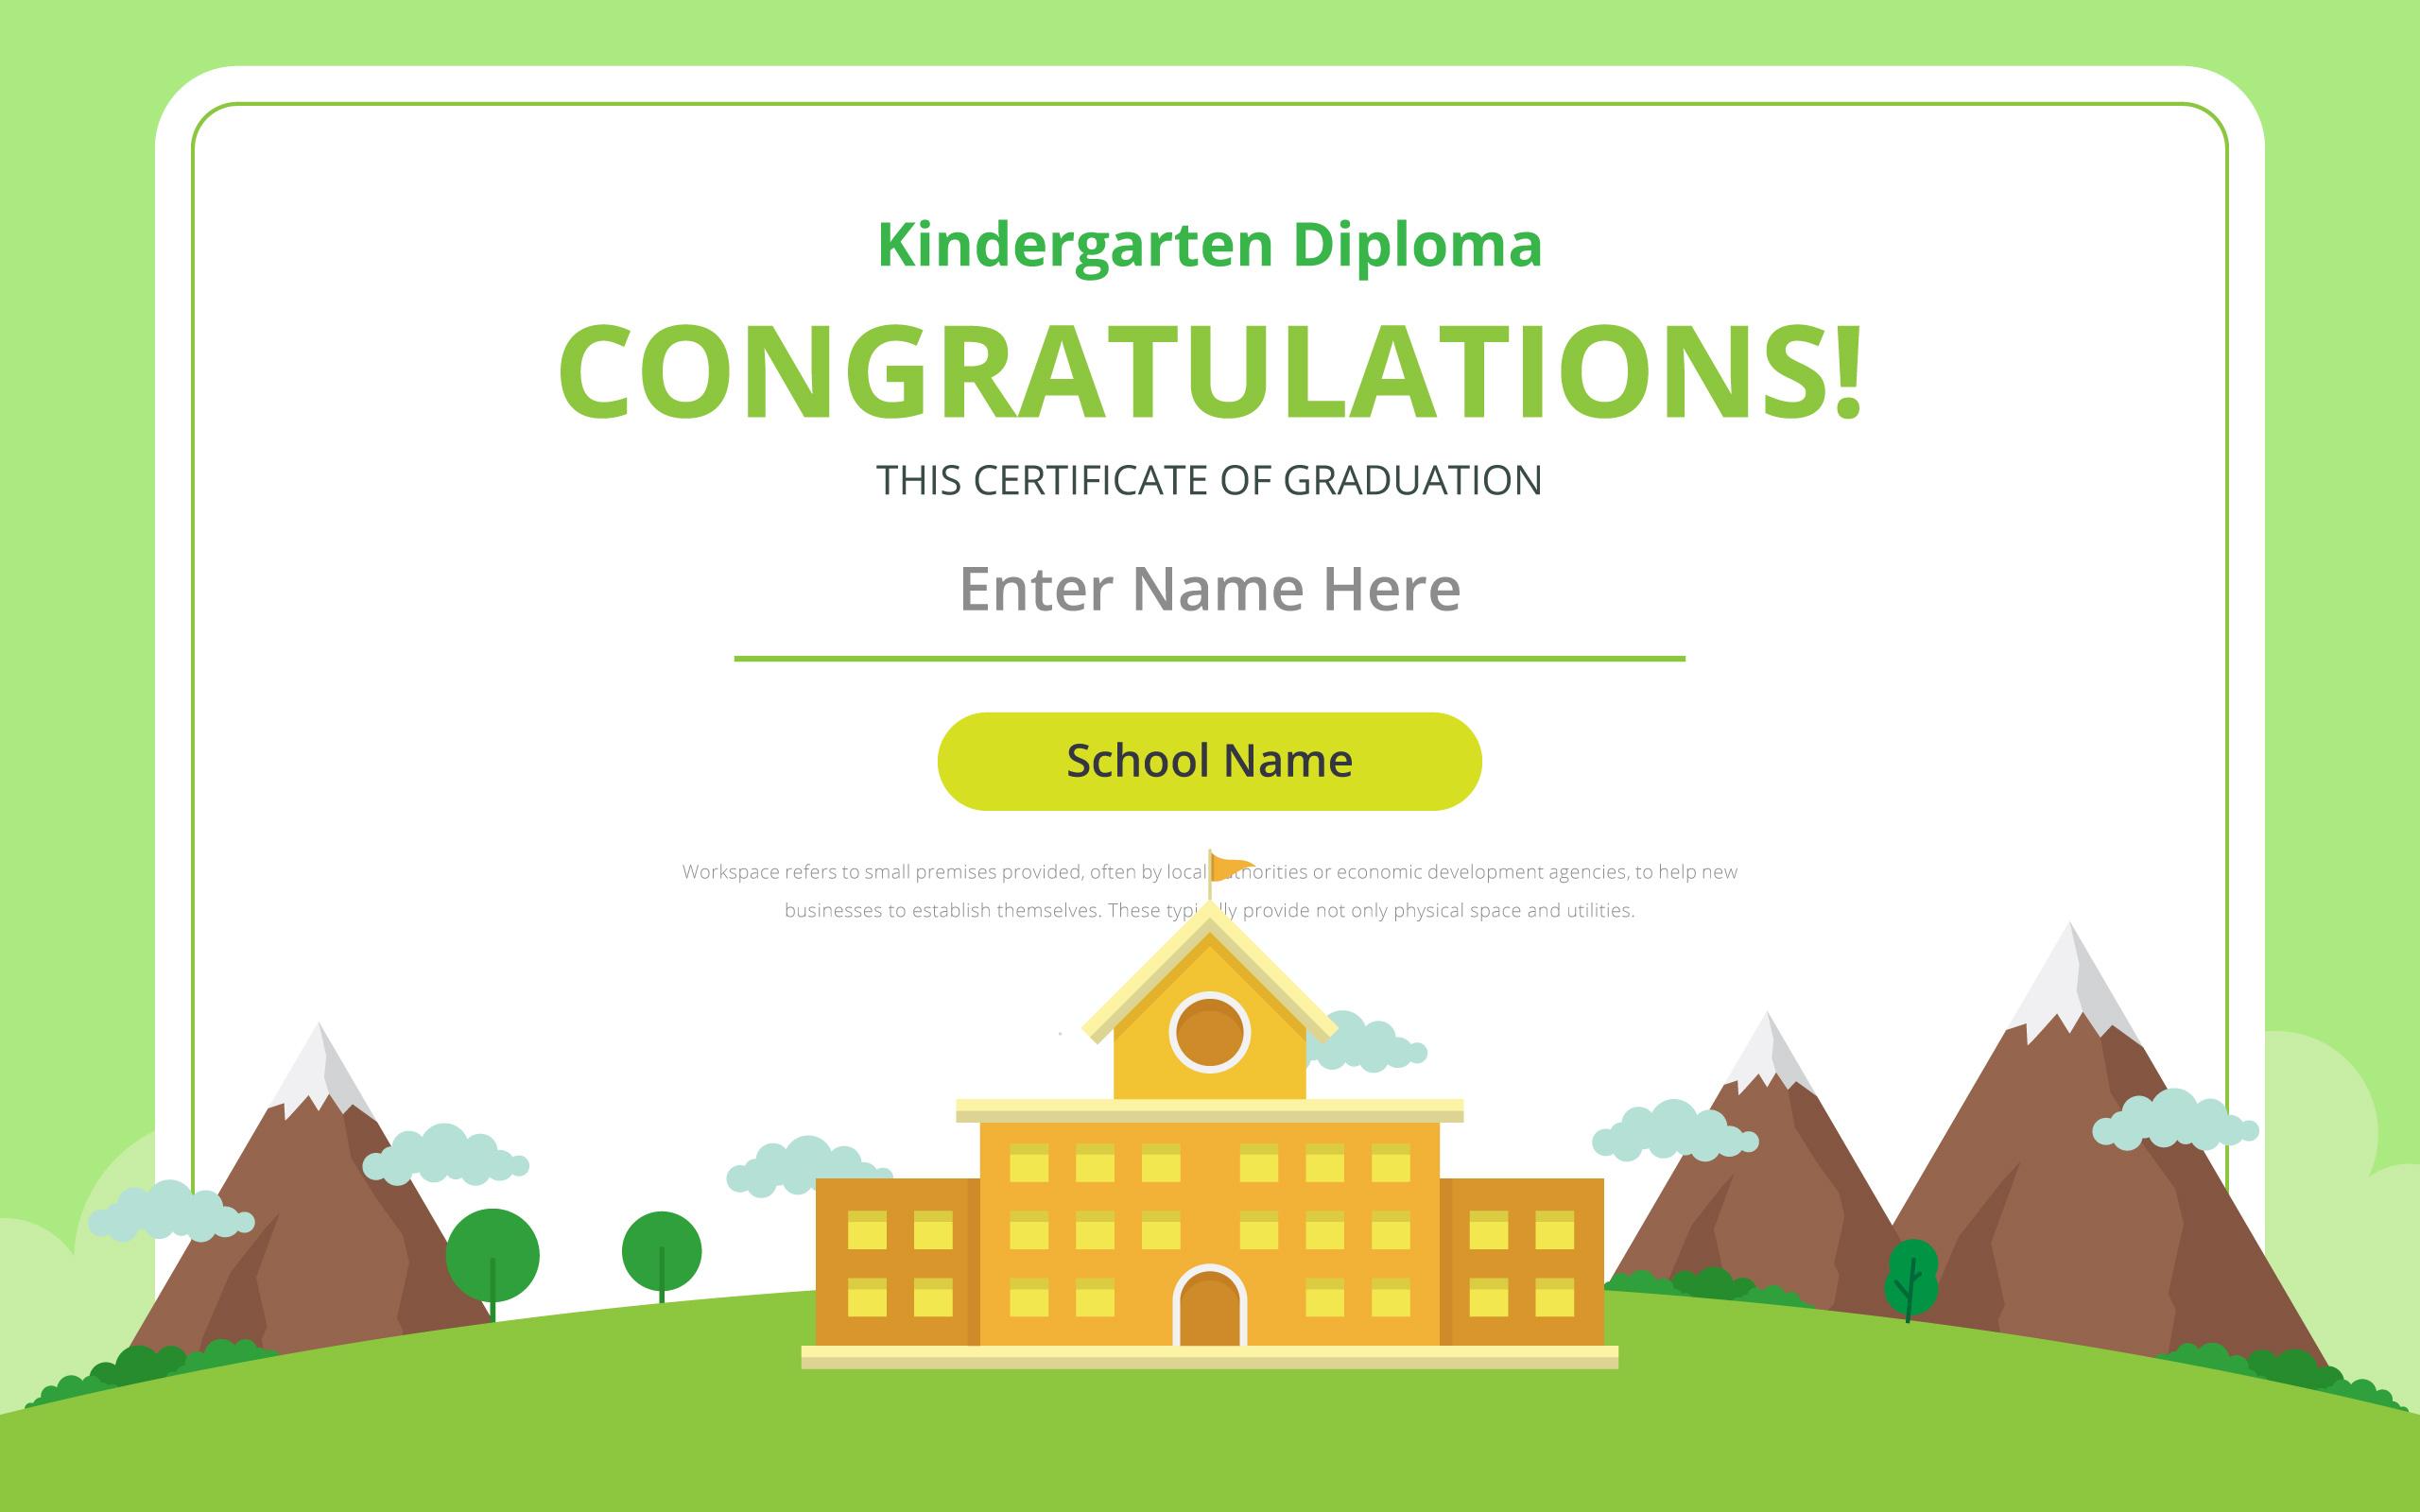 kindergarten diploma certificate template download free vector art stock graphics images. Black Bedroom Furniture Sets. Home Design Ideas